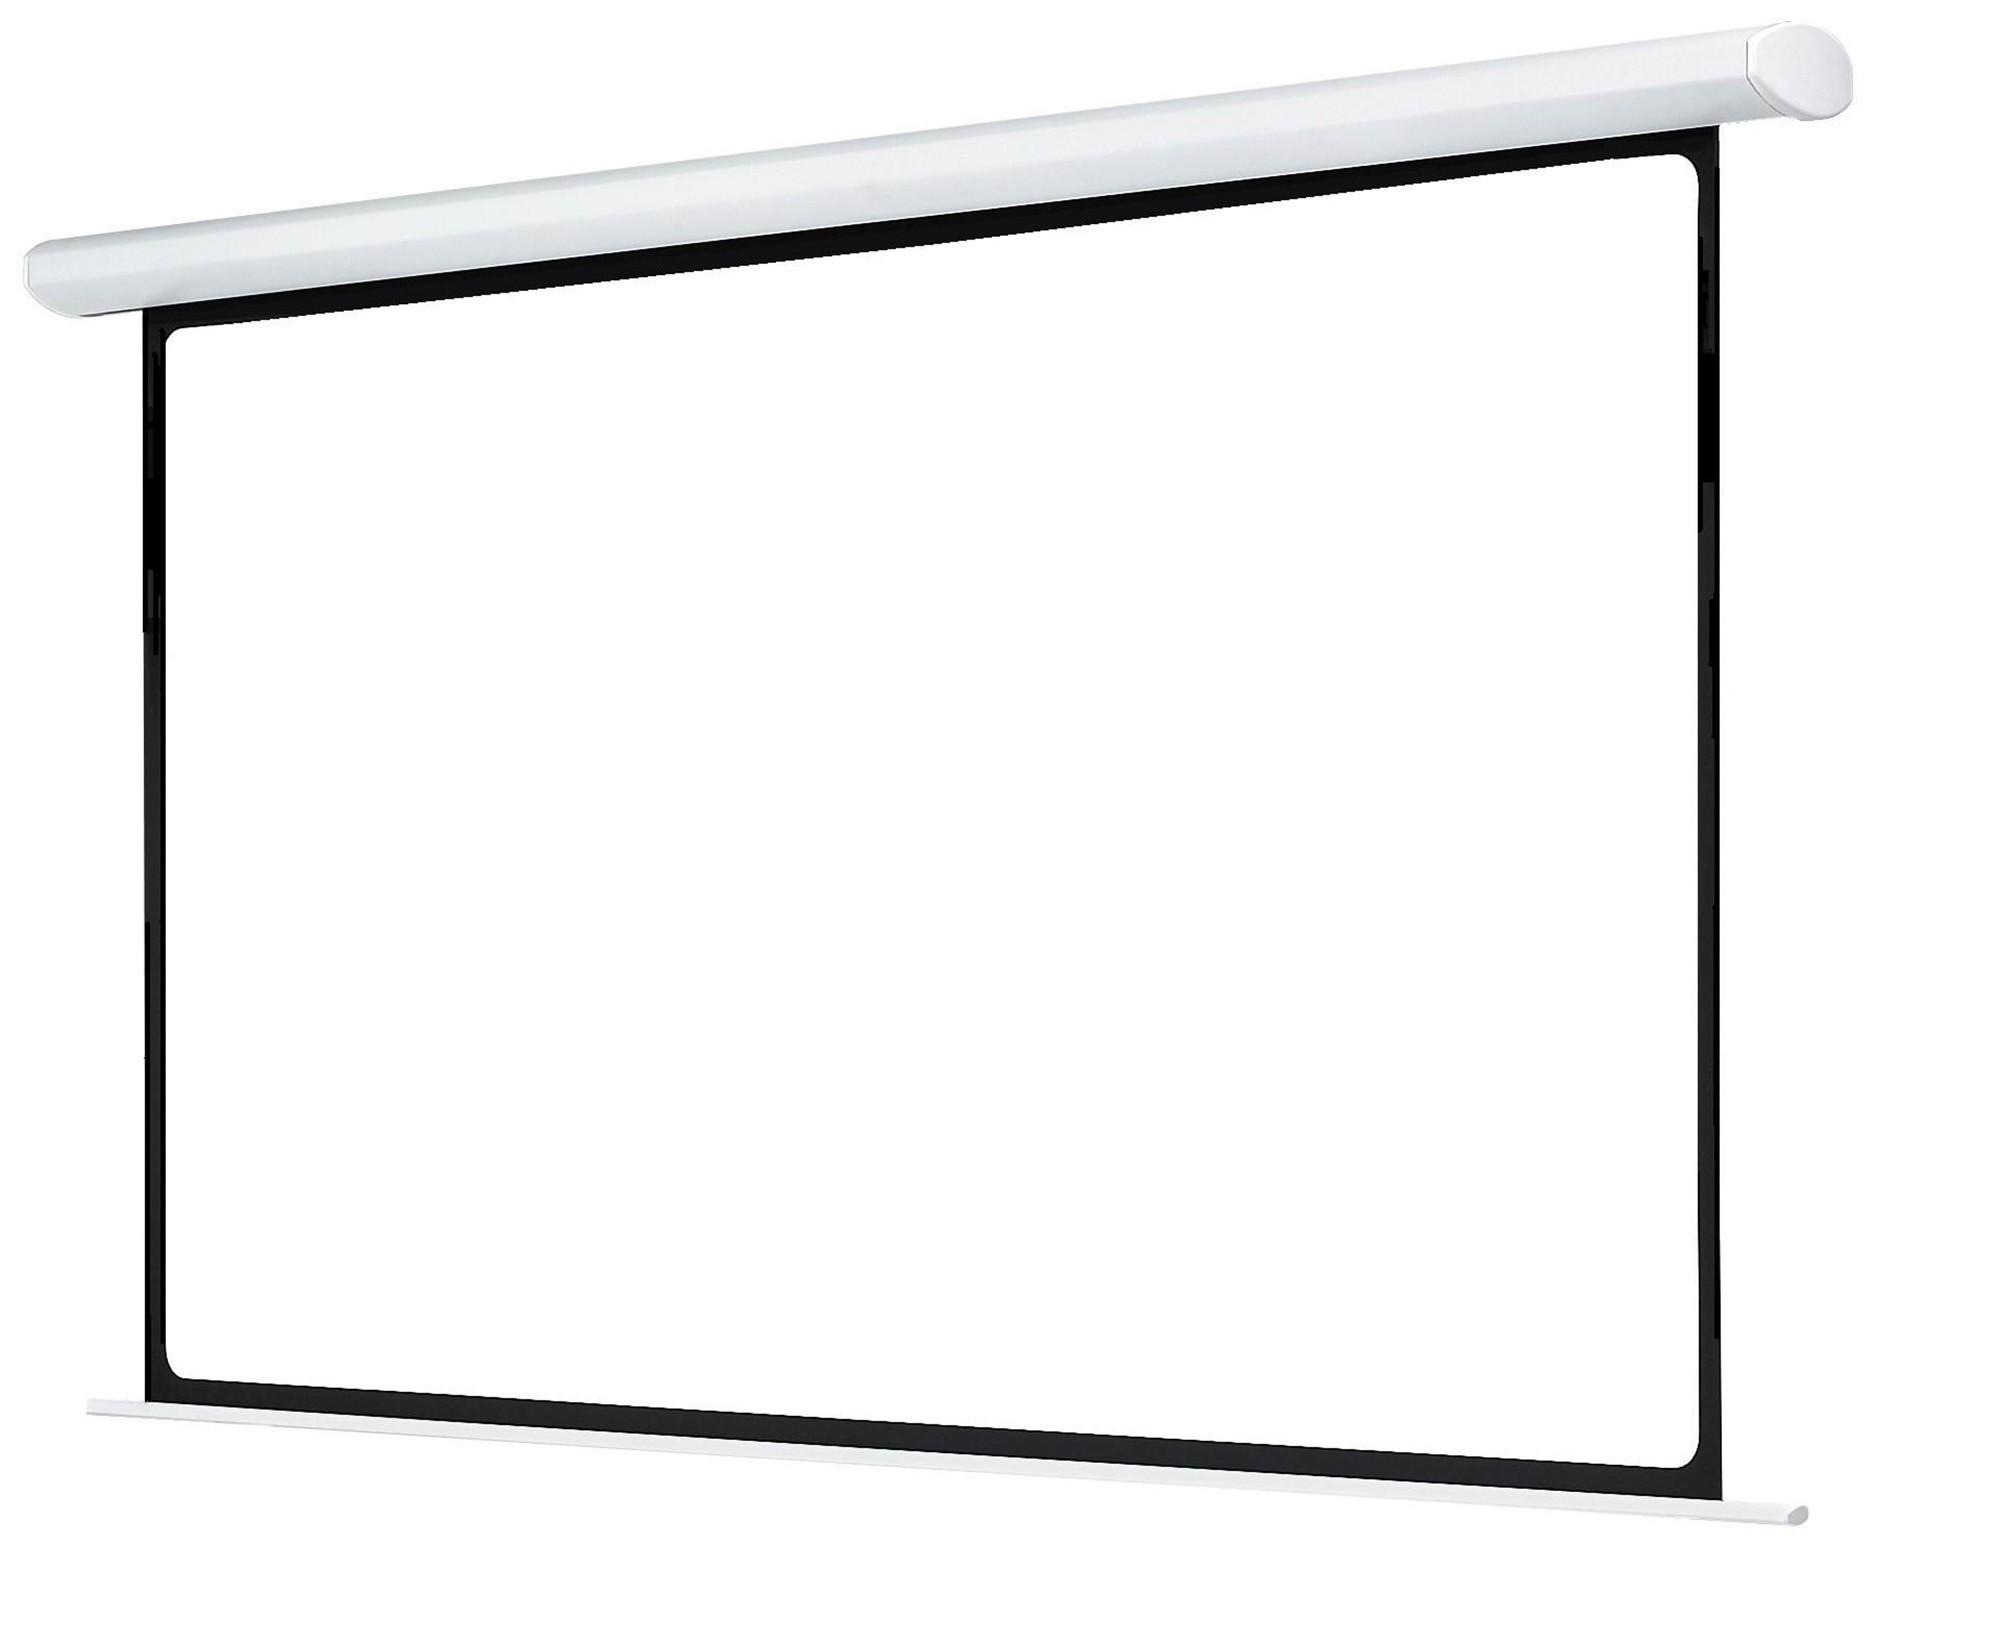 ecran de projection motoris oray hcm4 174x232 infrarouge. Black Bedroom Furniture Sets. Home Design Ideas